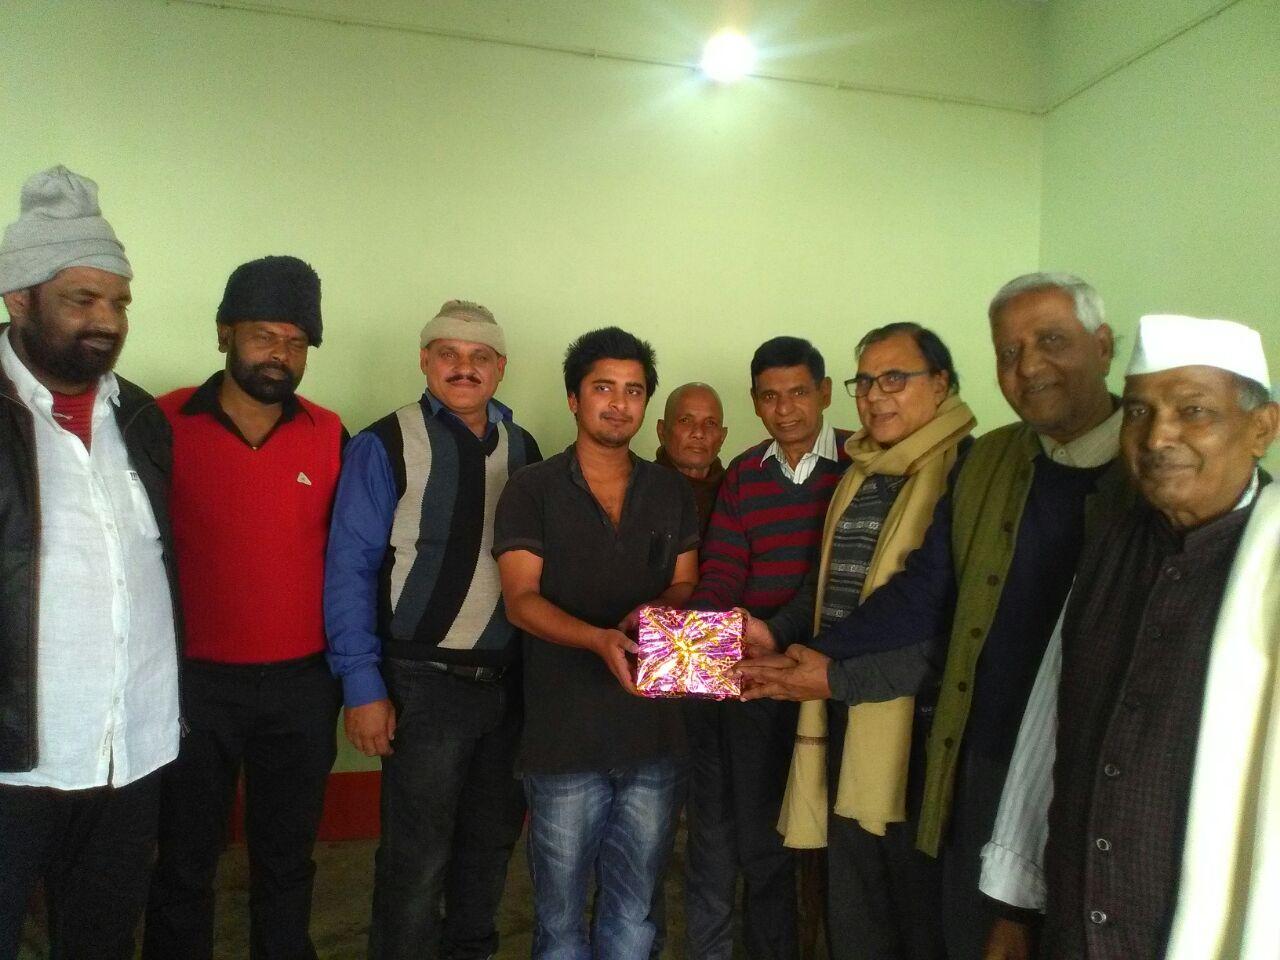 Samajsevi Dr.Madhepuri giving the best social activist award to a youth Kakkoo Kumar organised by Retired Army Man & Proprietor Dilip Kumar of Radha Krishna Sweets Corner Jaipalpatti Chowk in auspicious presence of Prof.S.K. Yadav , WC Dhyani Yadav , Dr.Arun Kumar and Parojee etc.